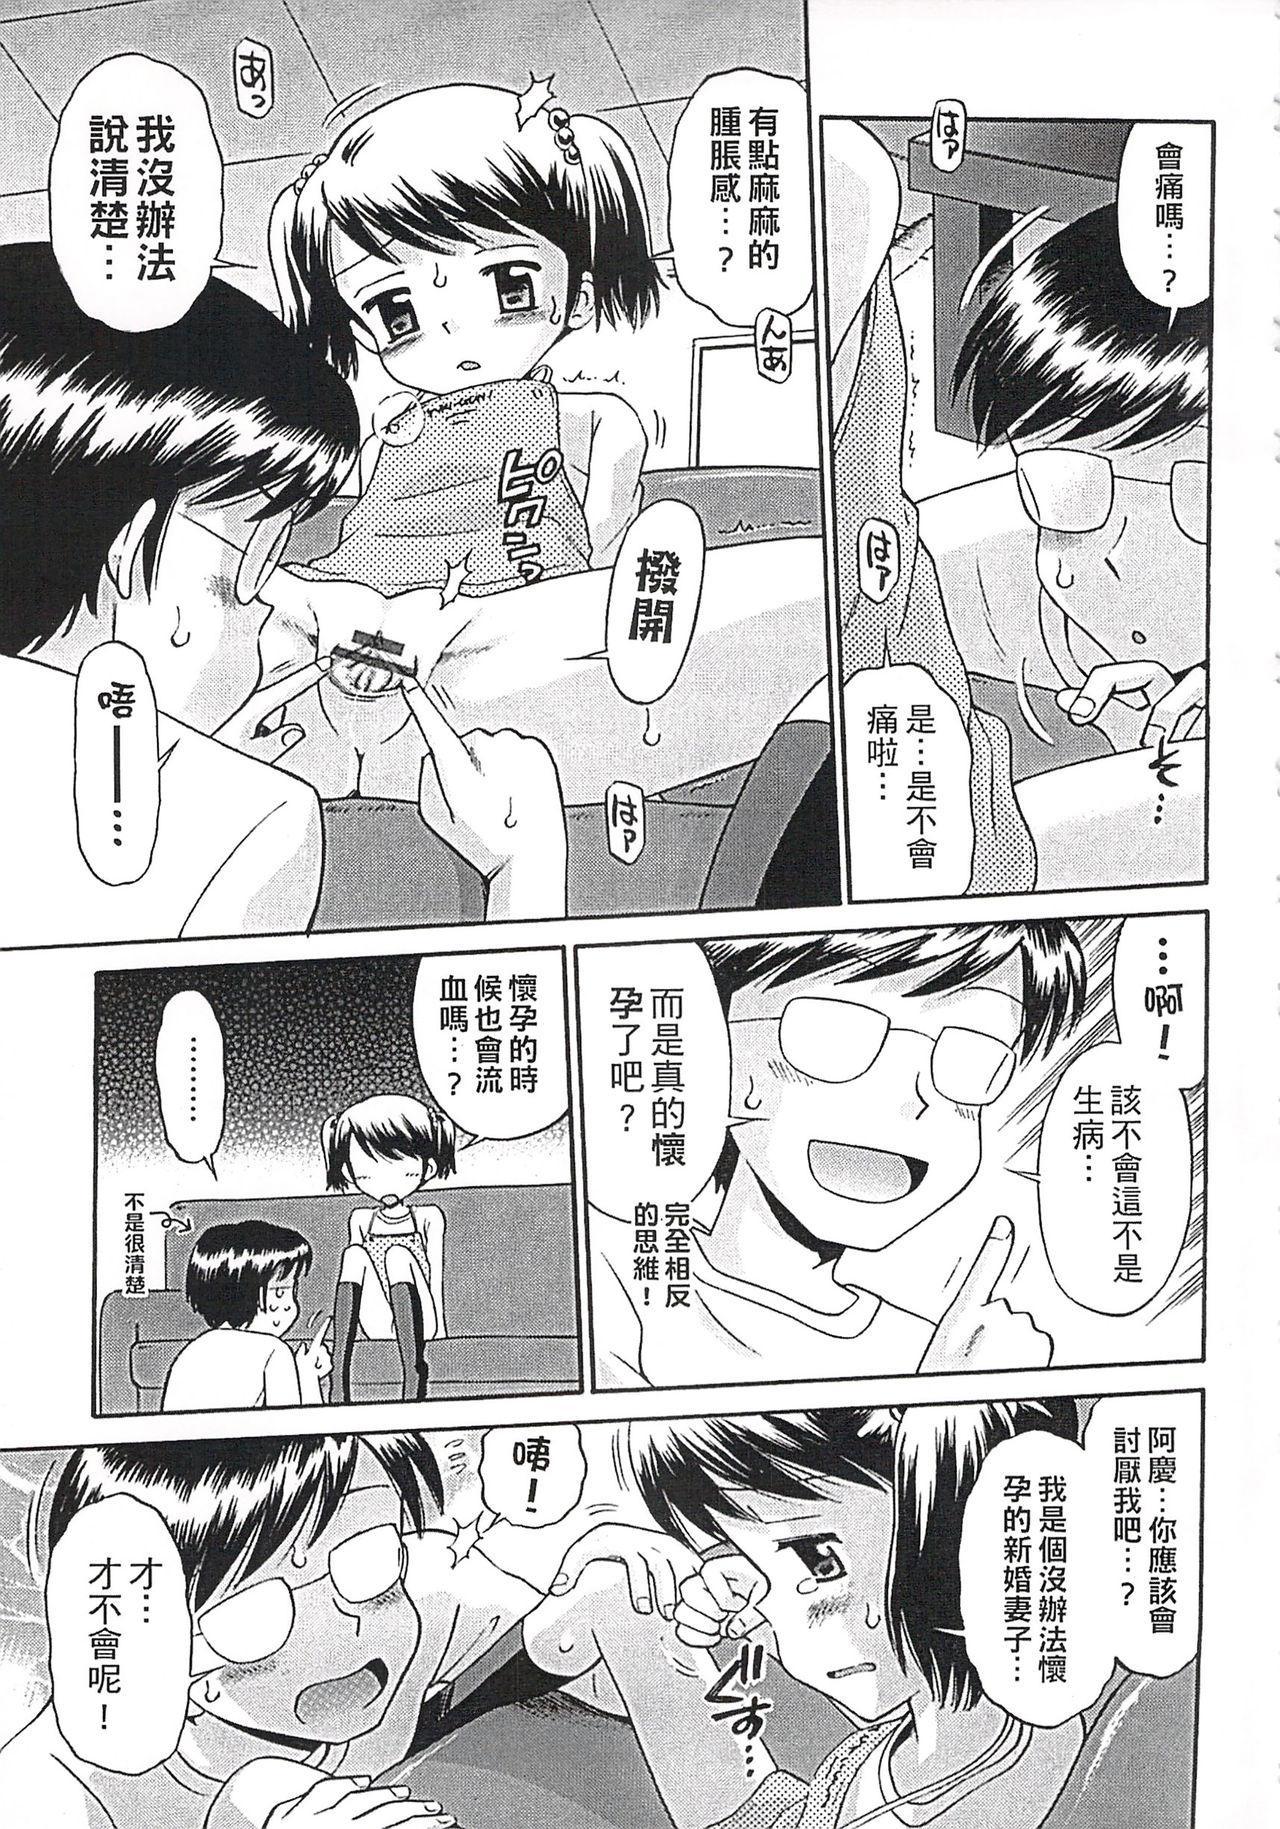 Kore demo Otona Desu Kedo!? Mrs.LOLITA Kanzenban   人家是大人啦! ~Mrs.LOLITA完全版 70